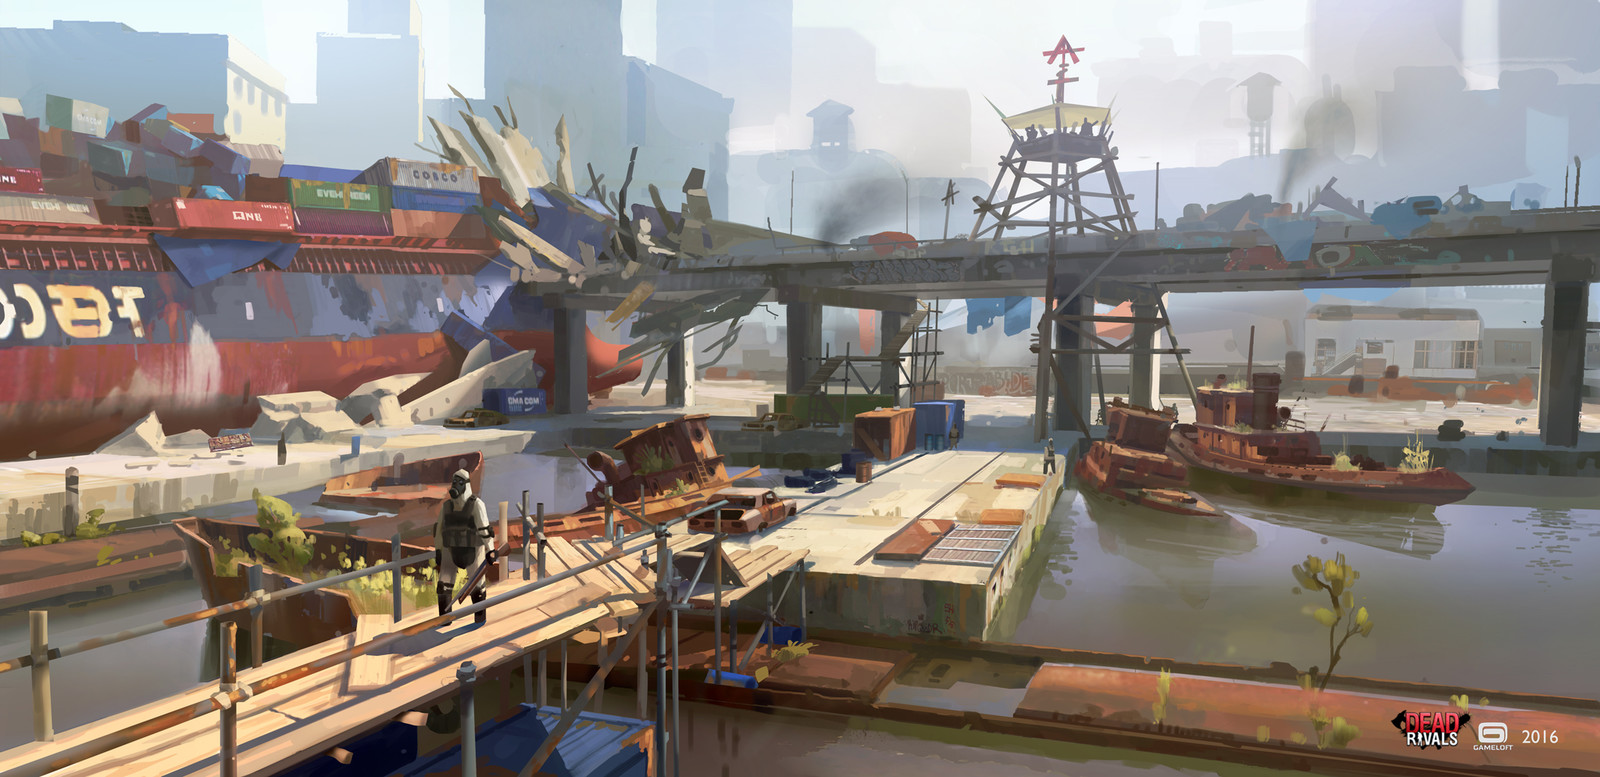 Dead Rivals - Port Areas